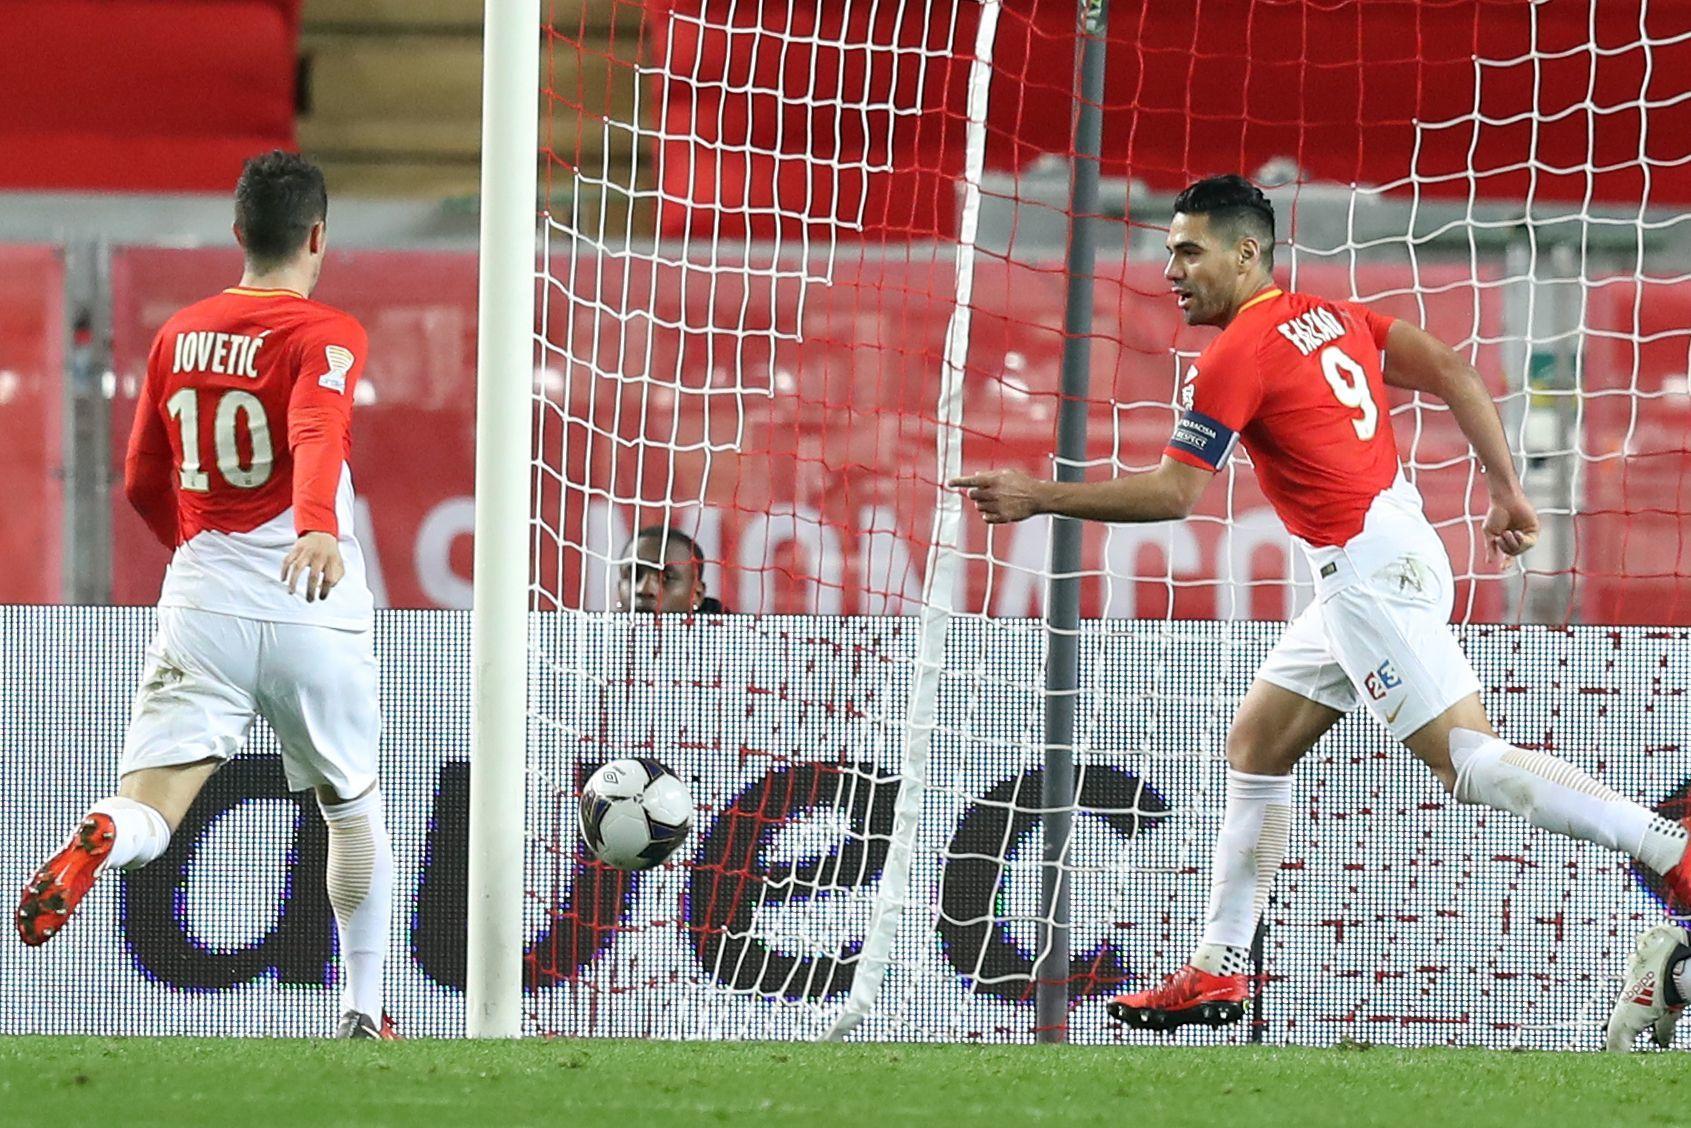 Falcao acude a celebrar un gol del Mónaco con Jovetic.